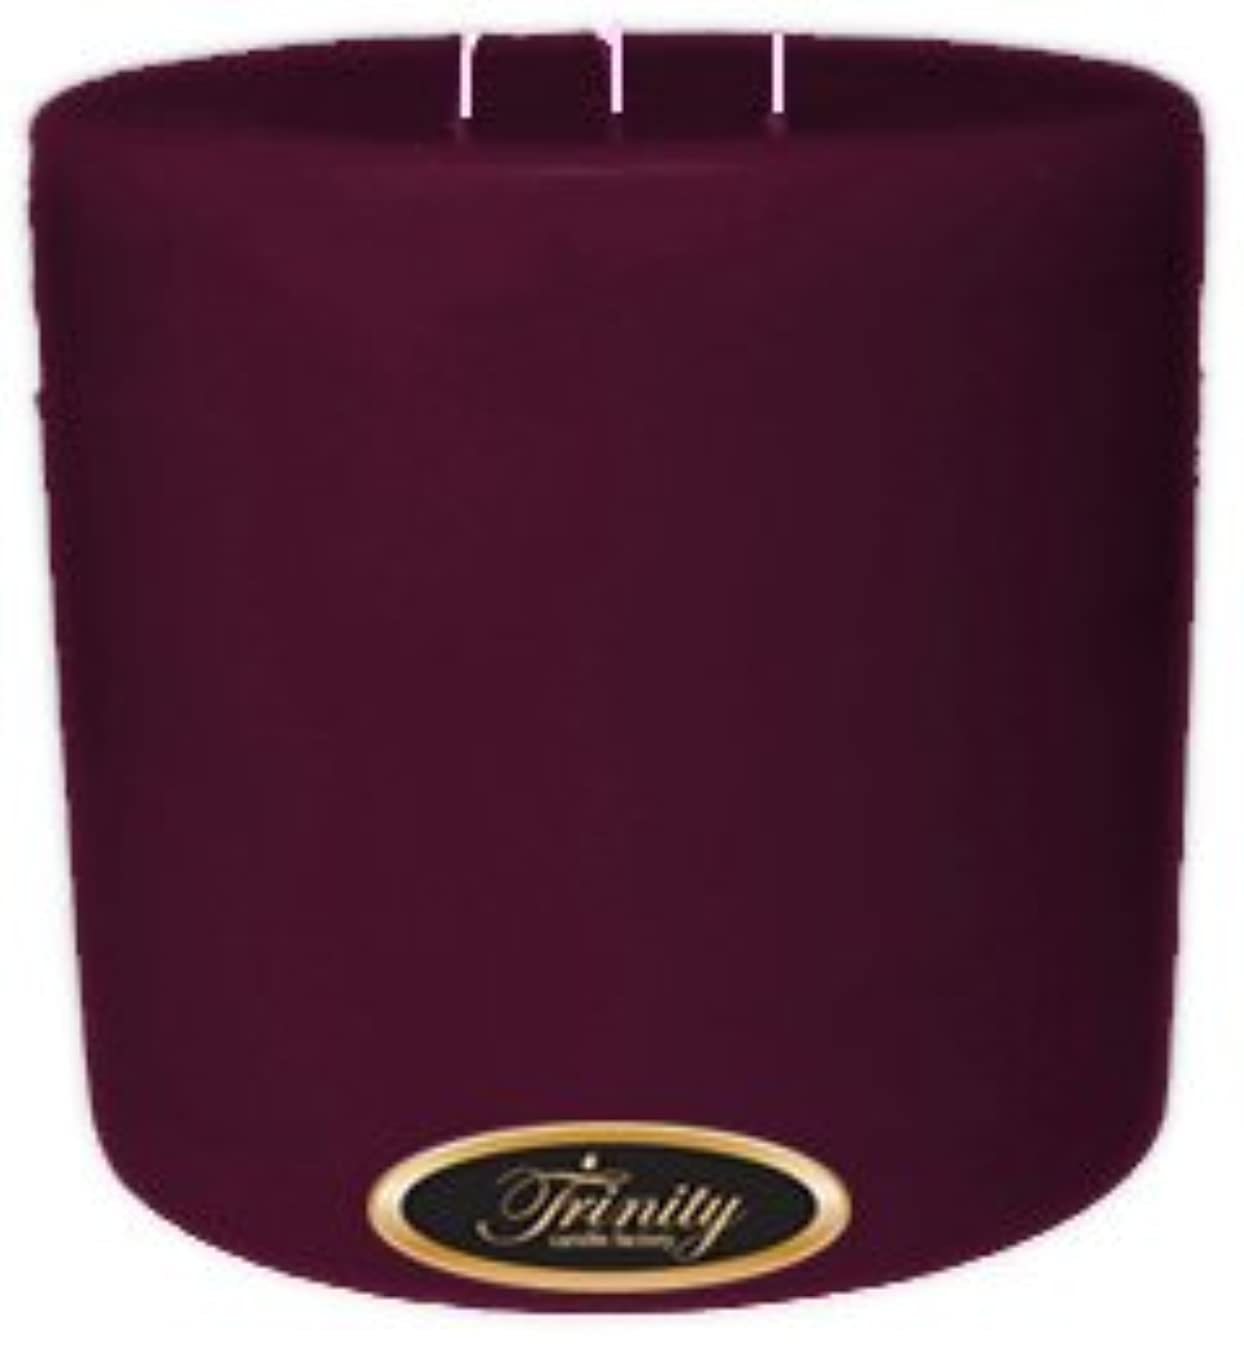 羨望主広々Trinity Candle工場 – Wisteria – Pillar Candle – 6 x 6